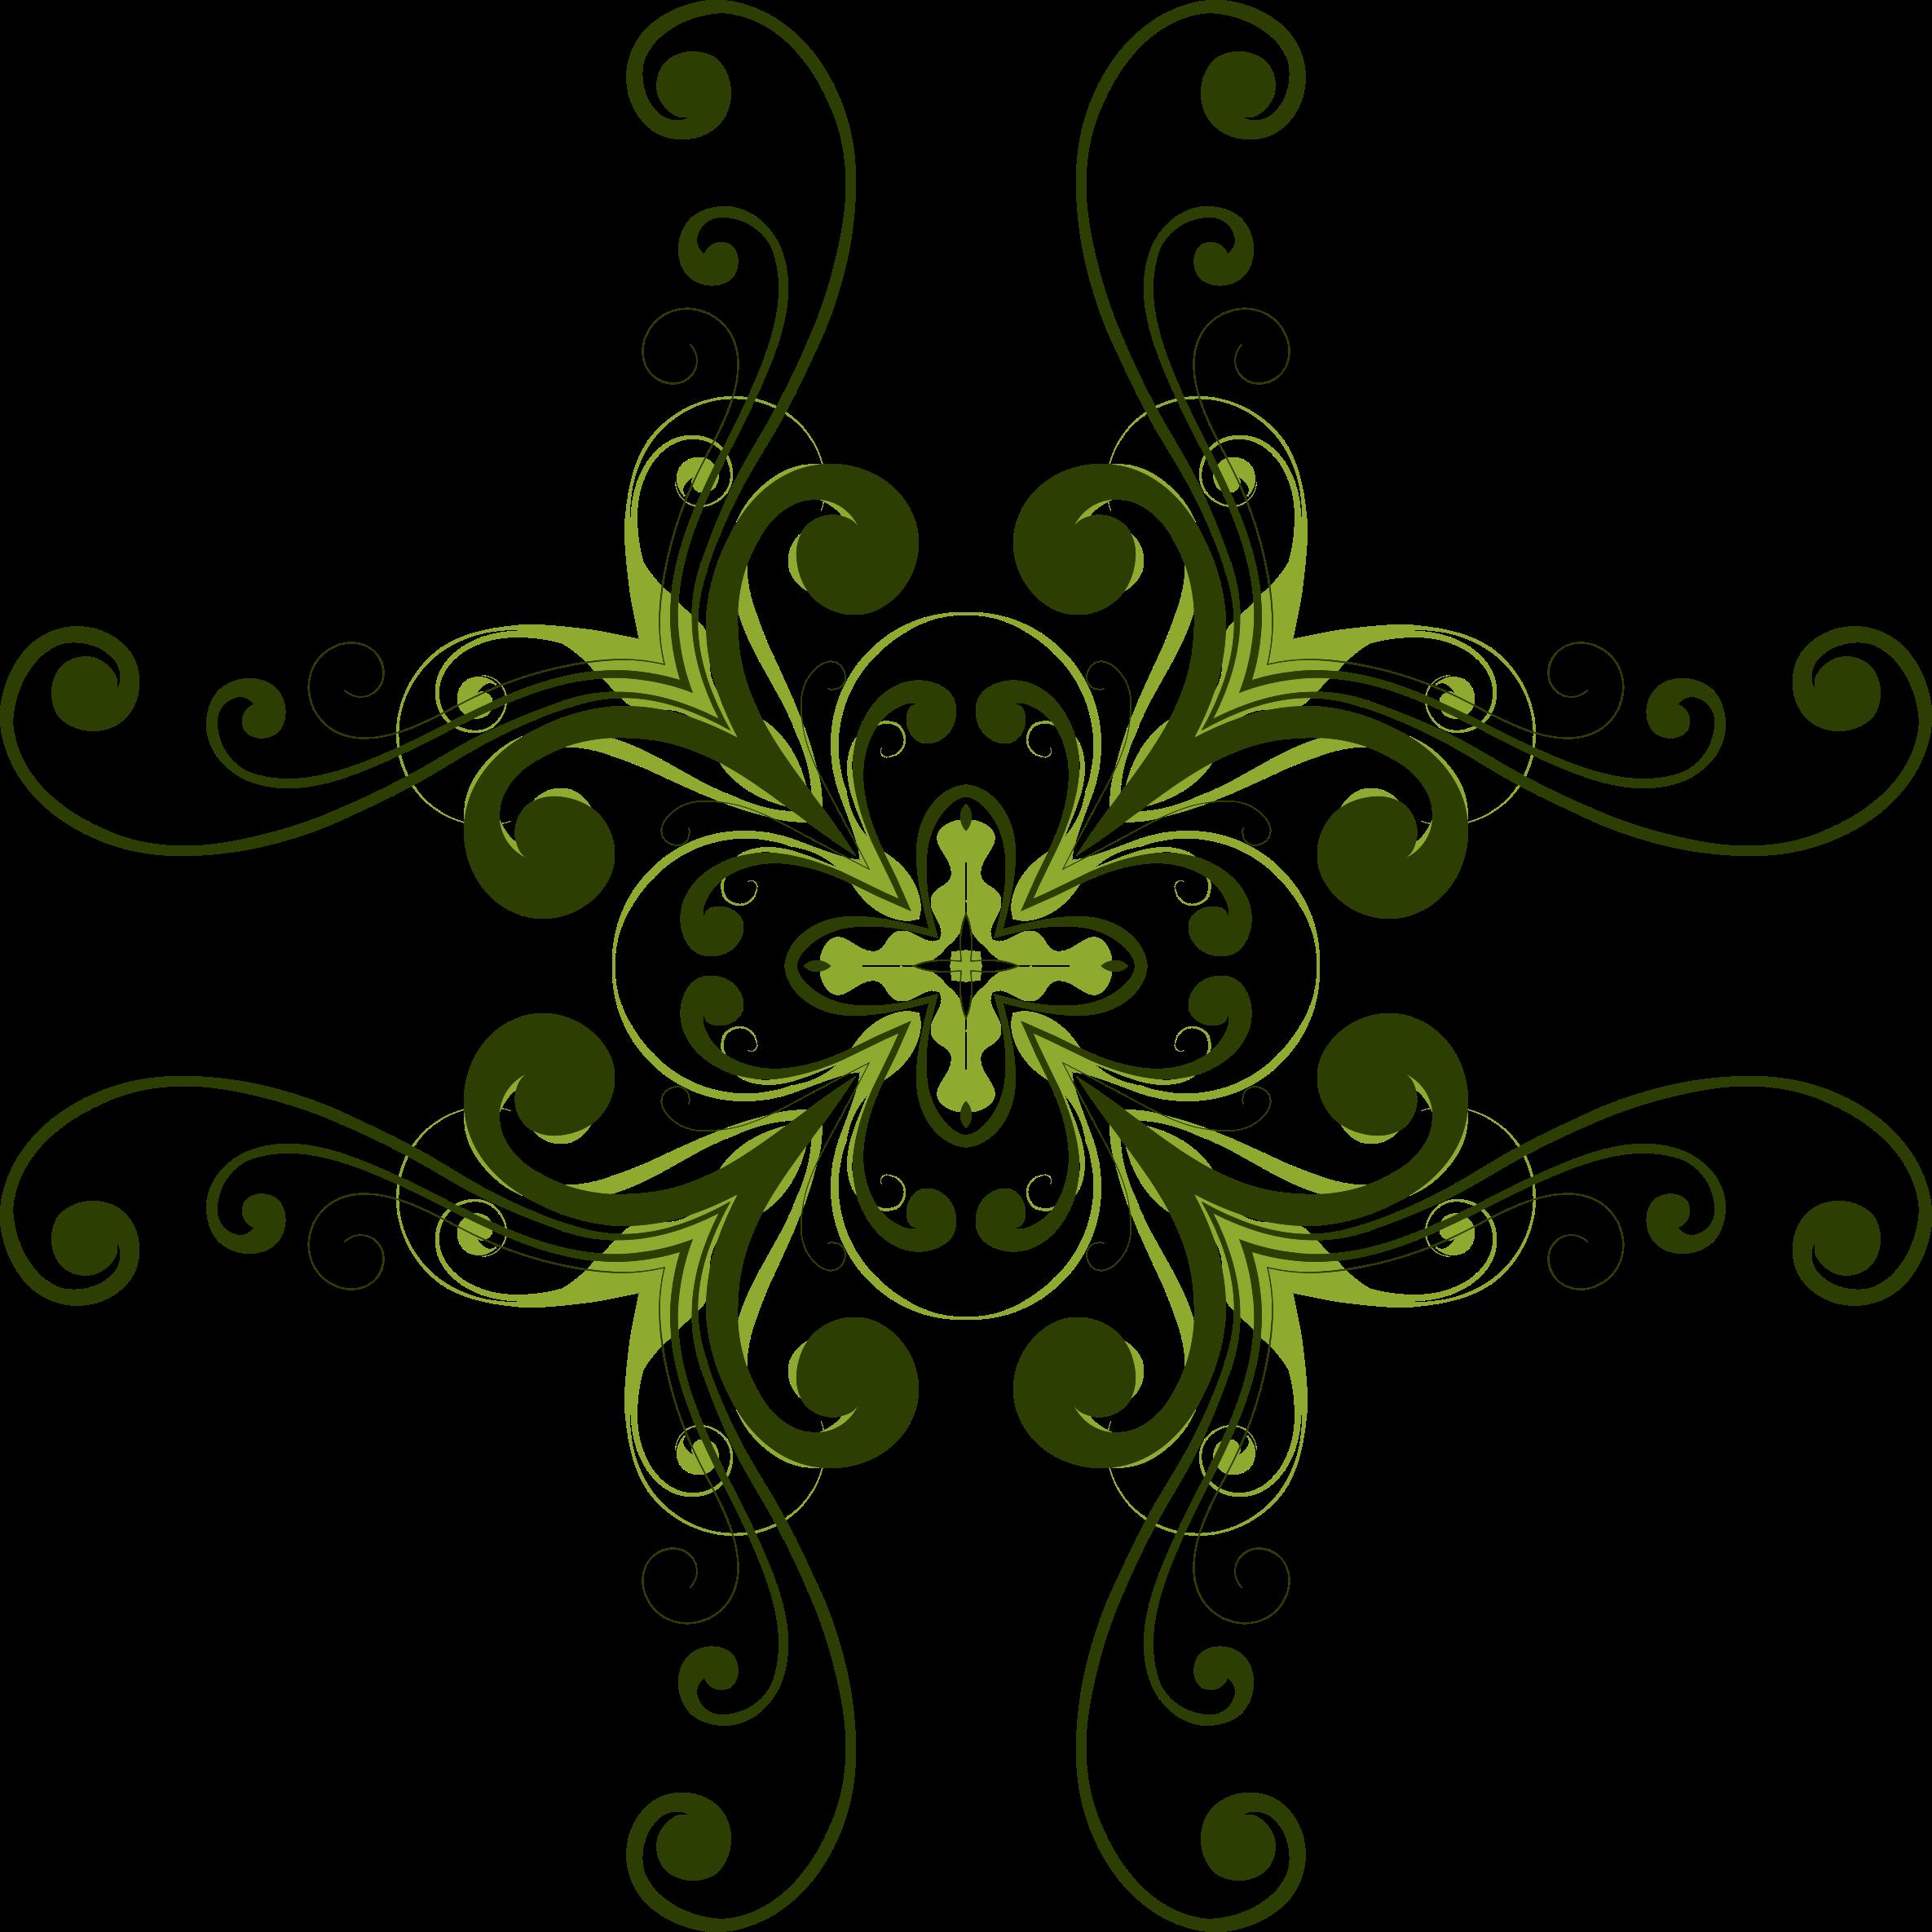 Flourish clipart flower. Design big image png